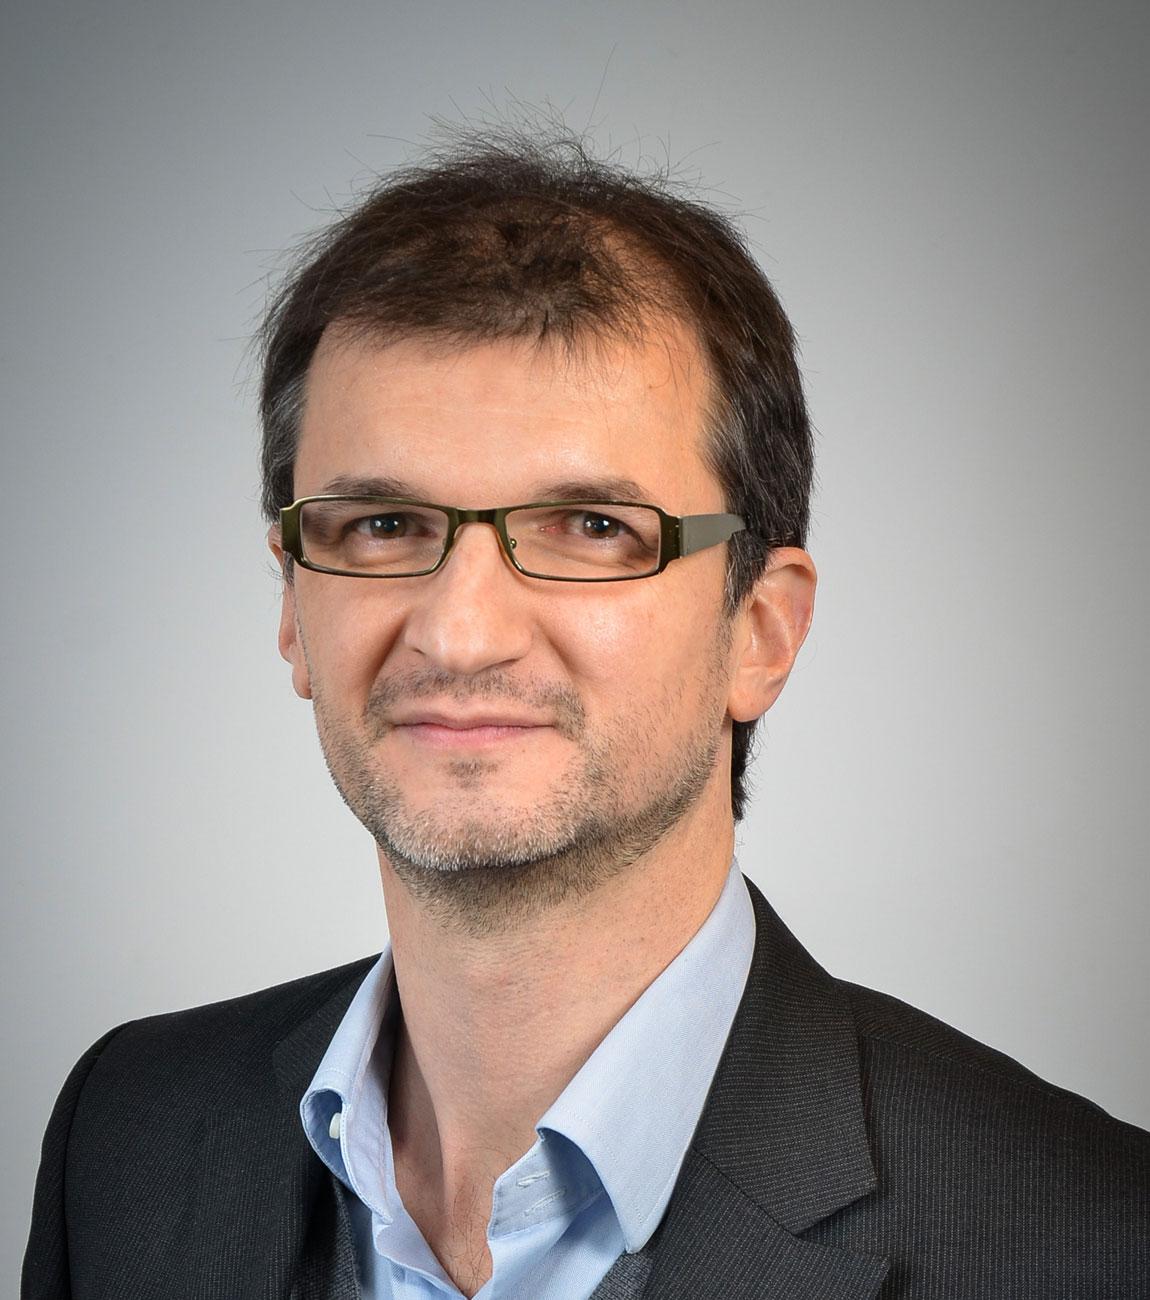 Frederic Gaye